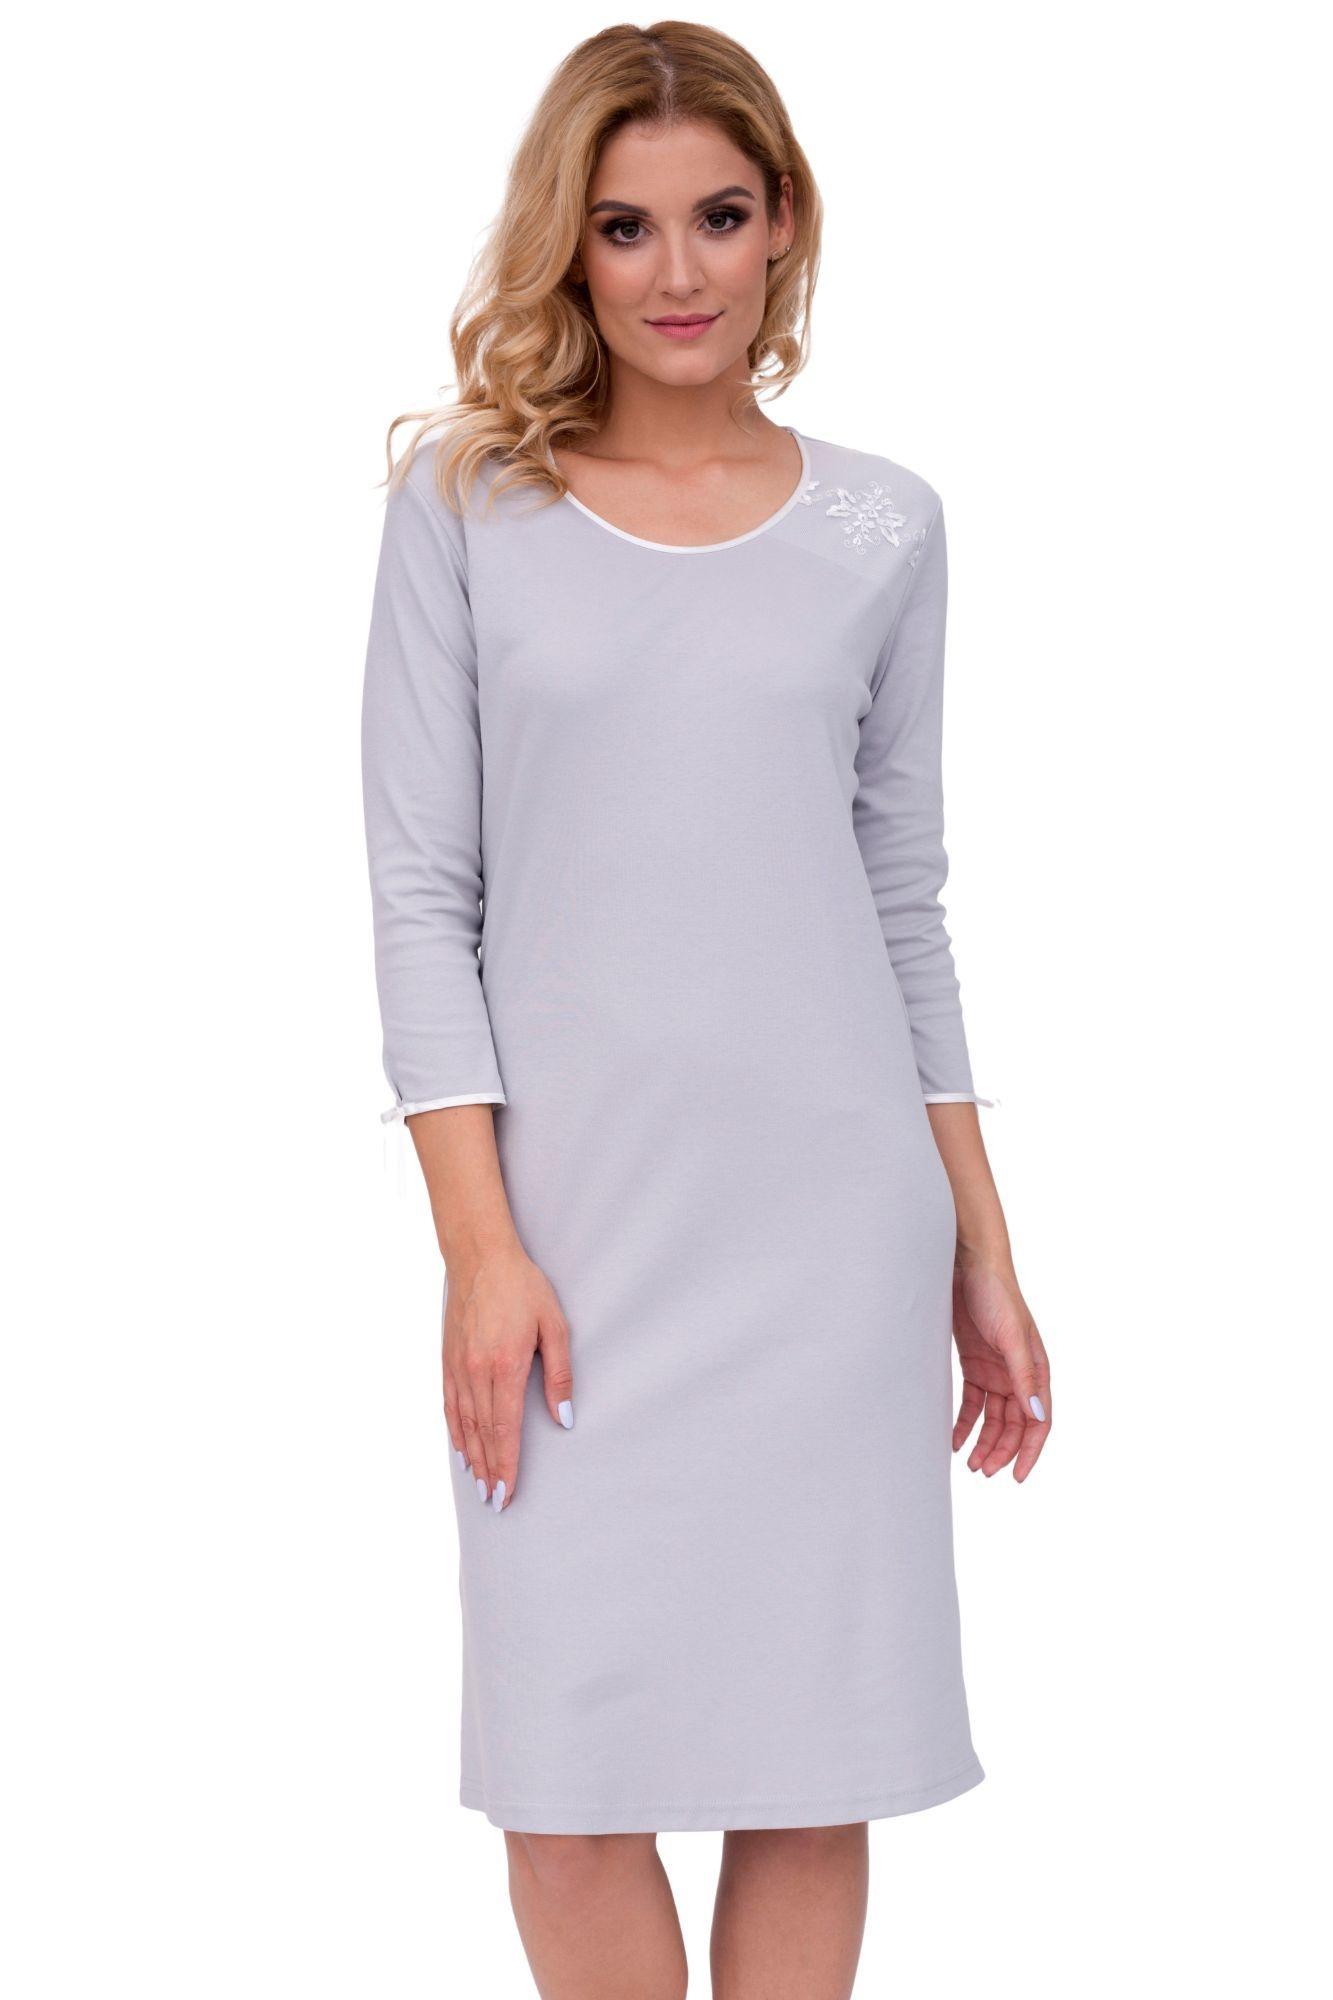 a0c26d512075 Luxusná dámska nočná košeľa Marta sivá - ELEGANT.sk